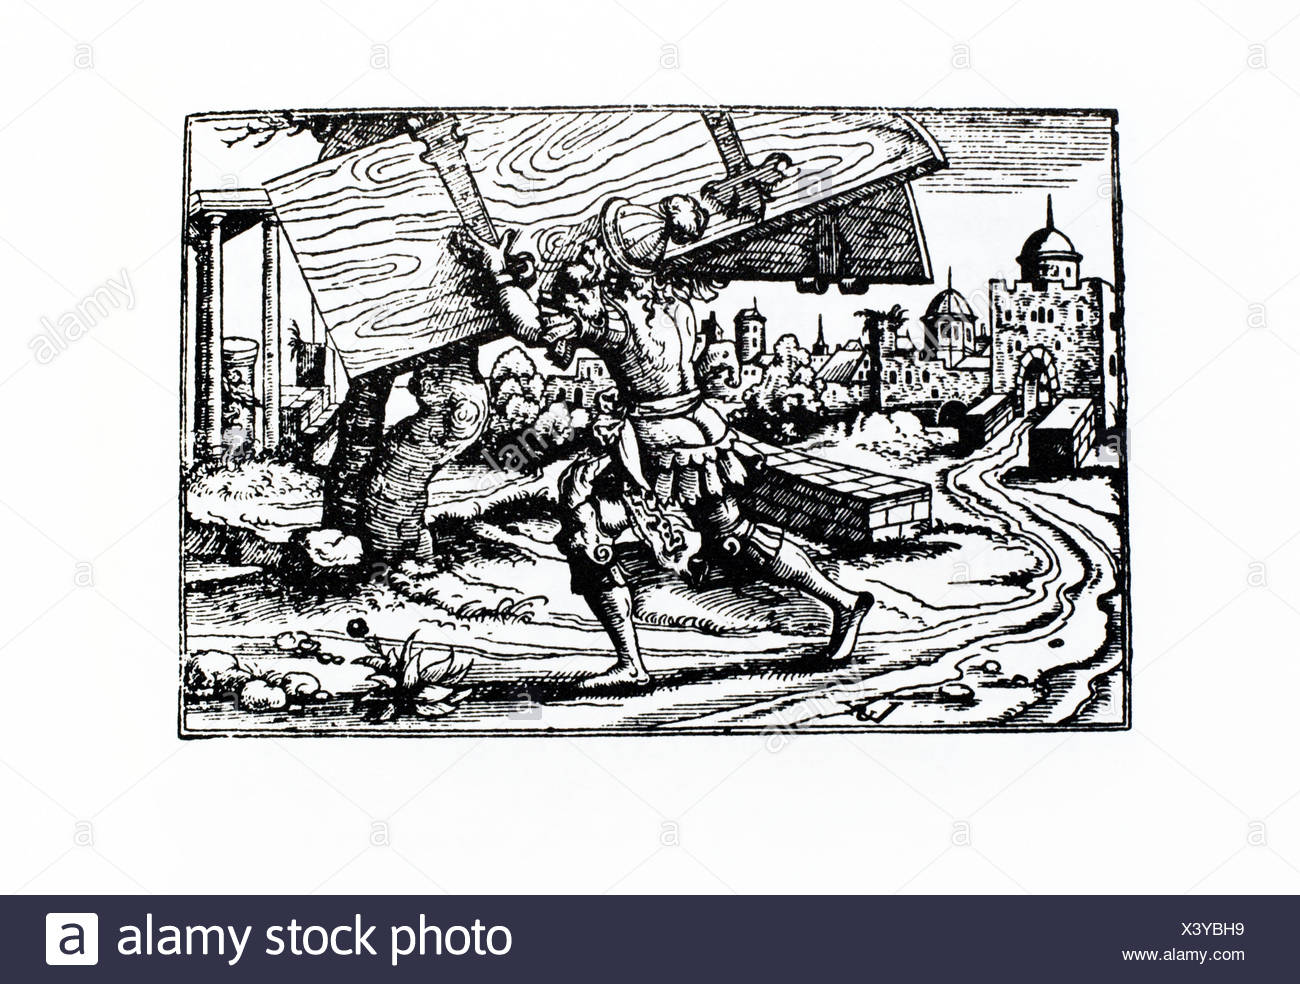 Samson carrying the gates of Gaza. German Bible. Frankfurt, 1570. - Stock Image